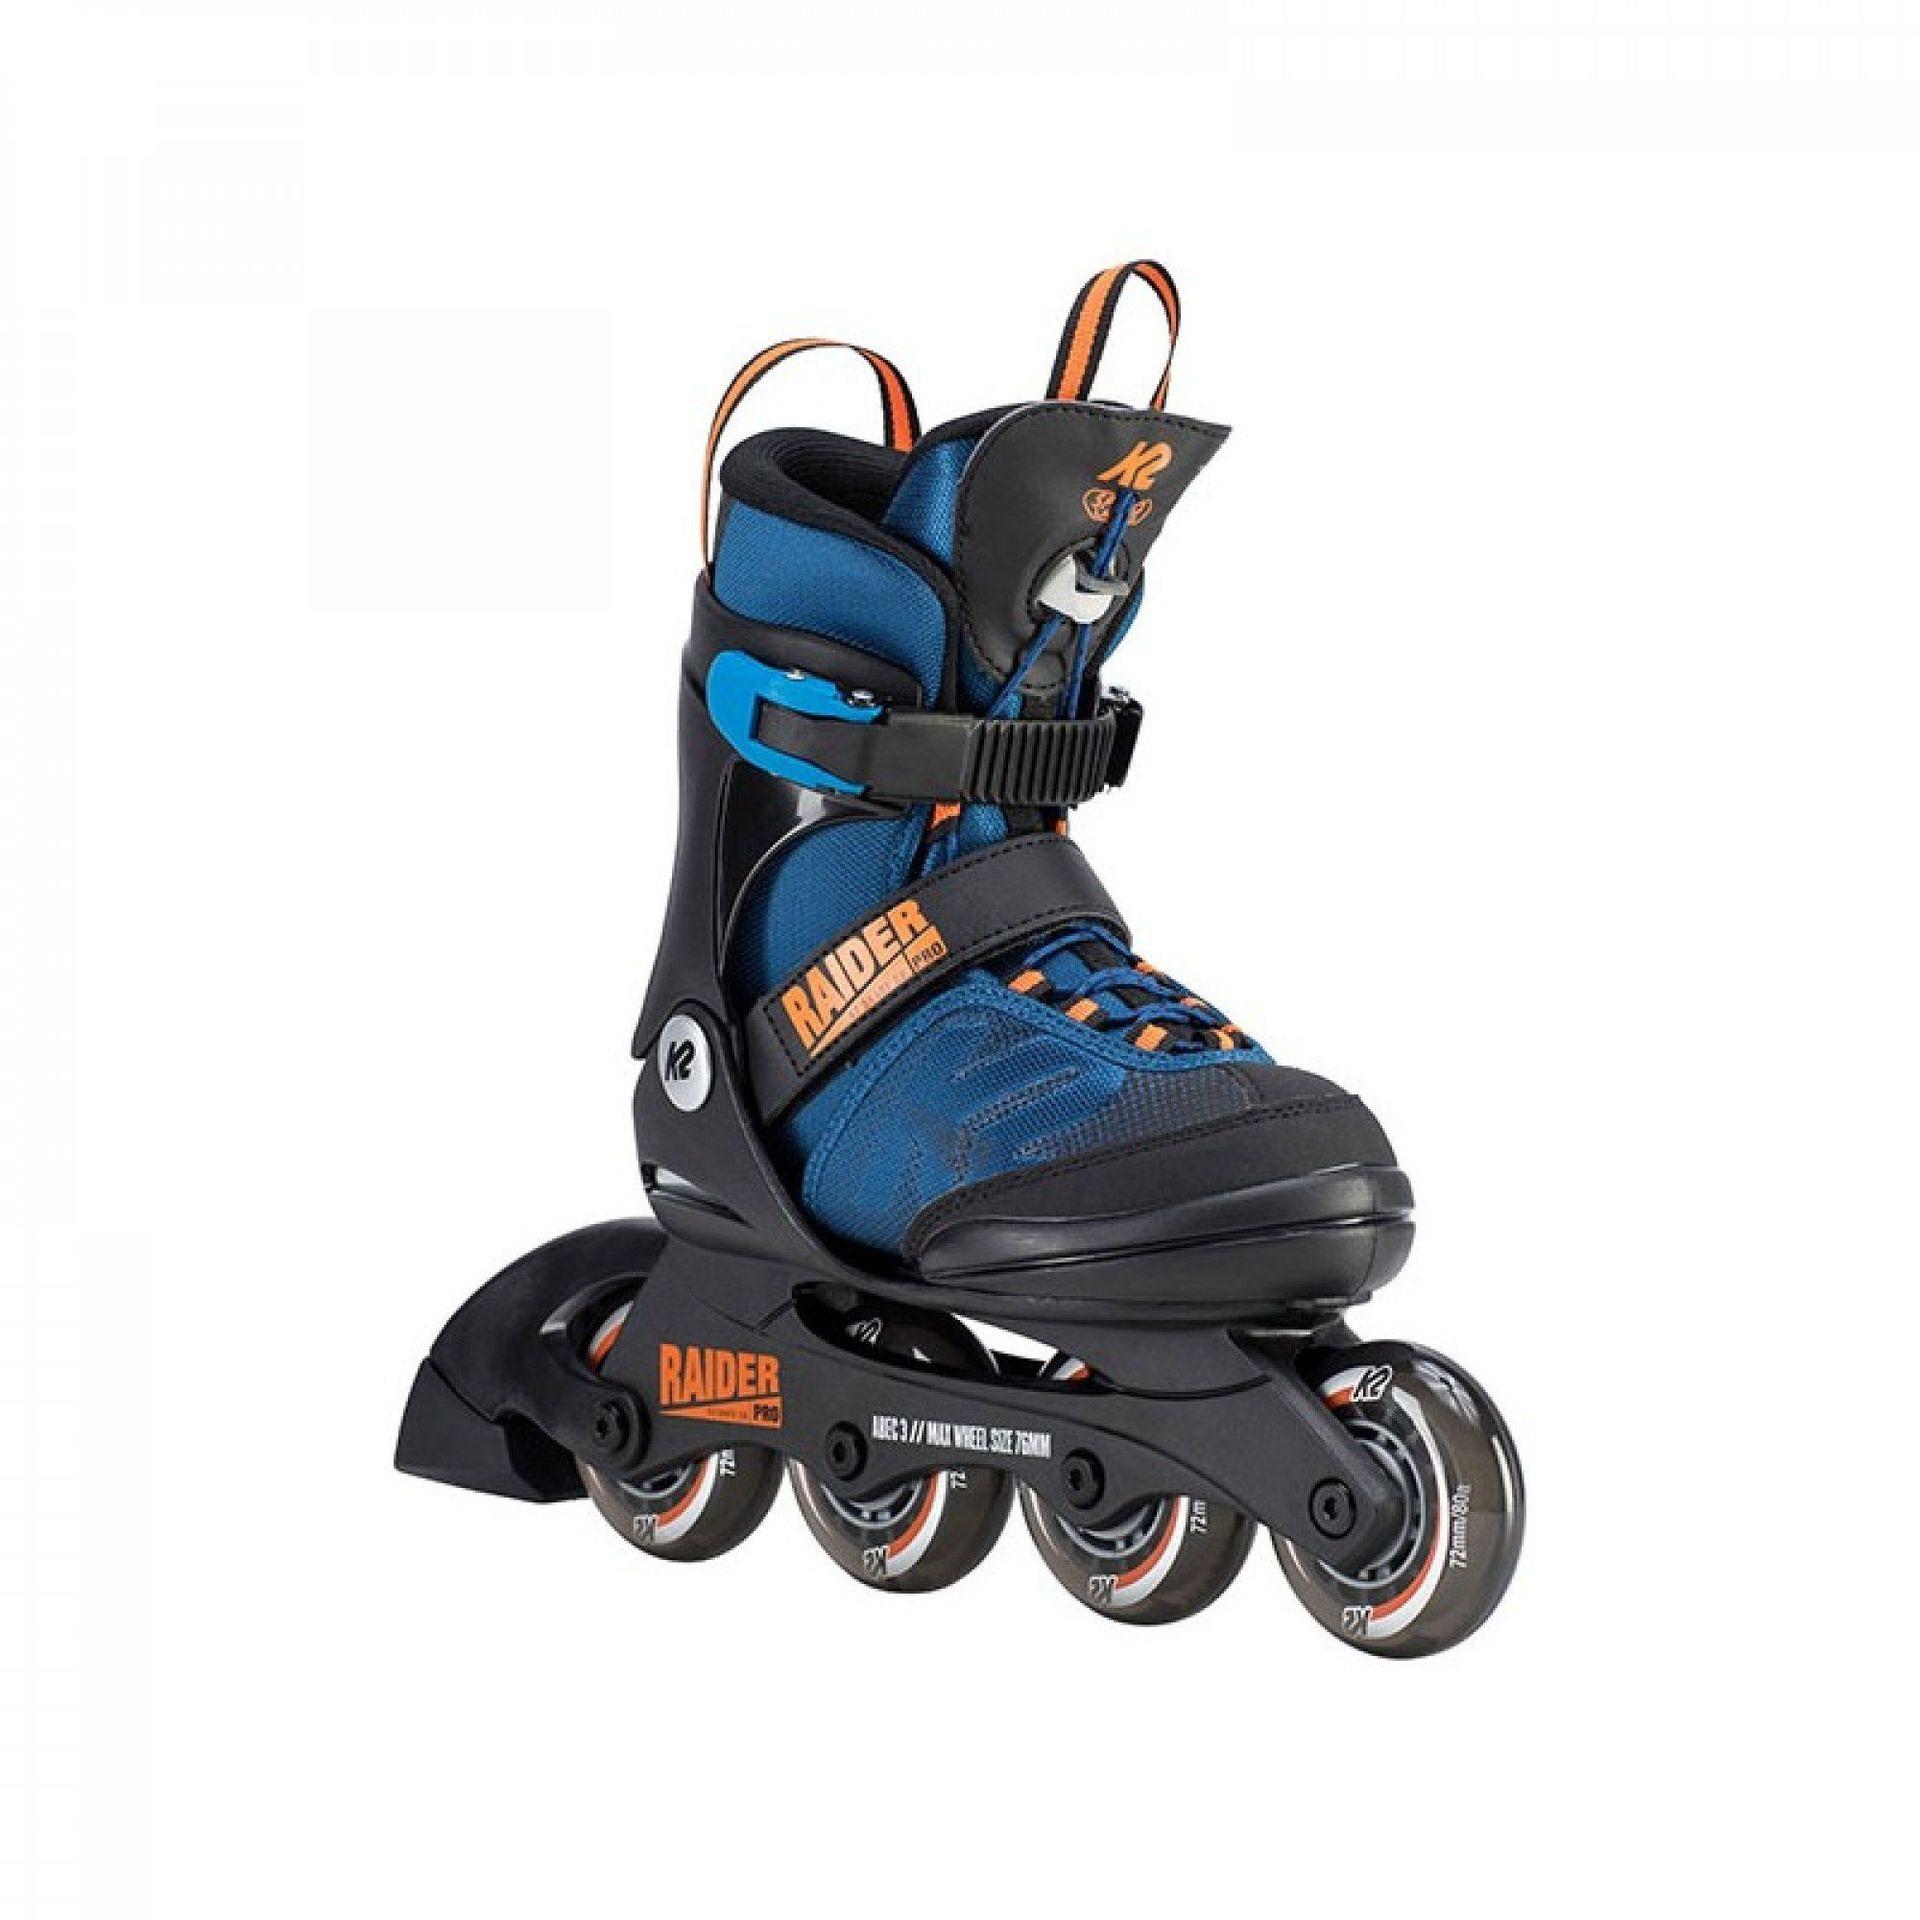 ROLKI K2 RAIDER PRO BLUE 30D0221